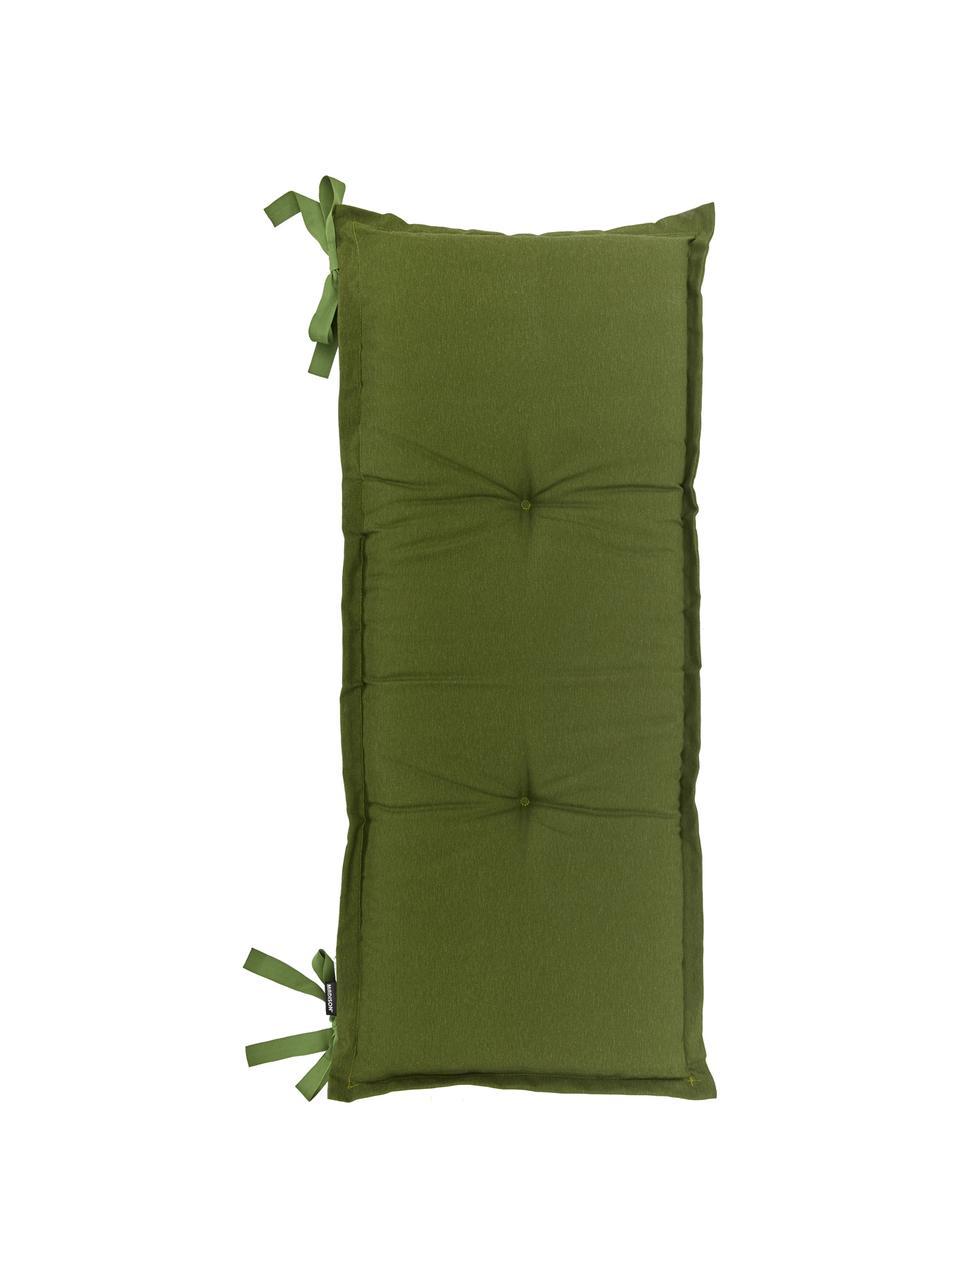 Einfarbige Bankauflage Panama in Grün, Bezug: 50% Baumwolle, 45% Polyes, Grün, 48 x 120 cm